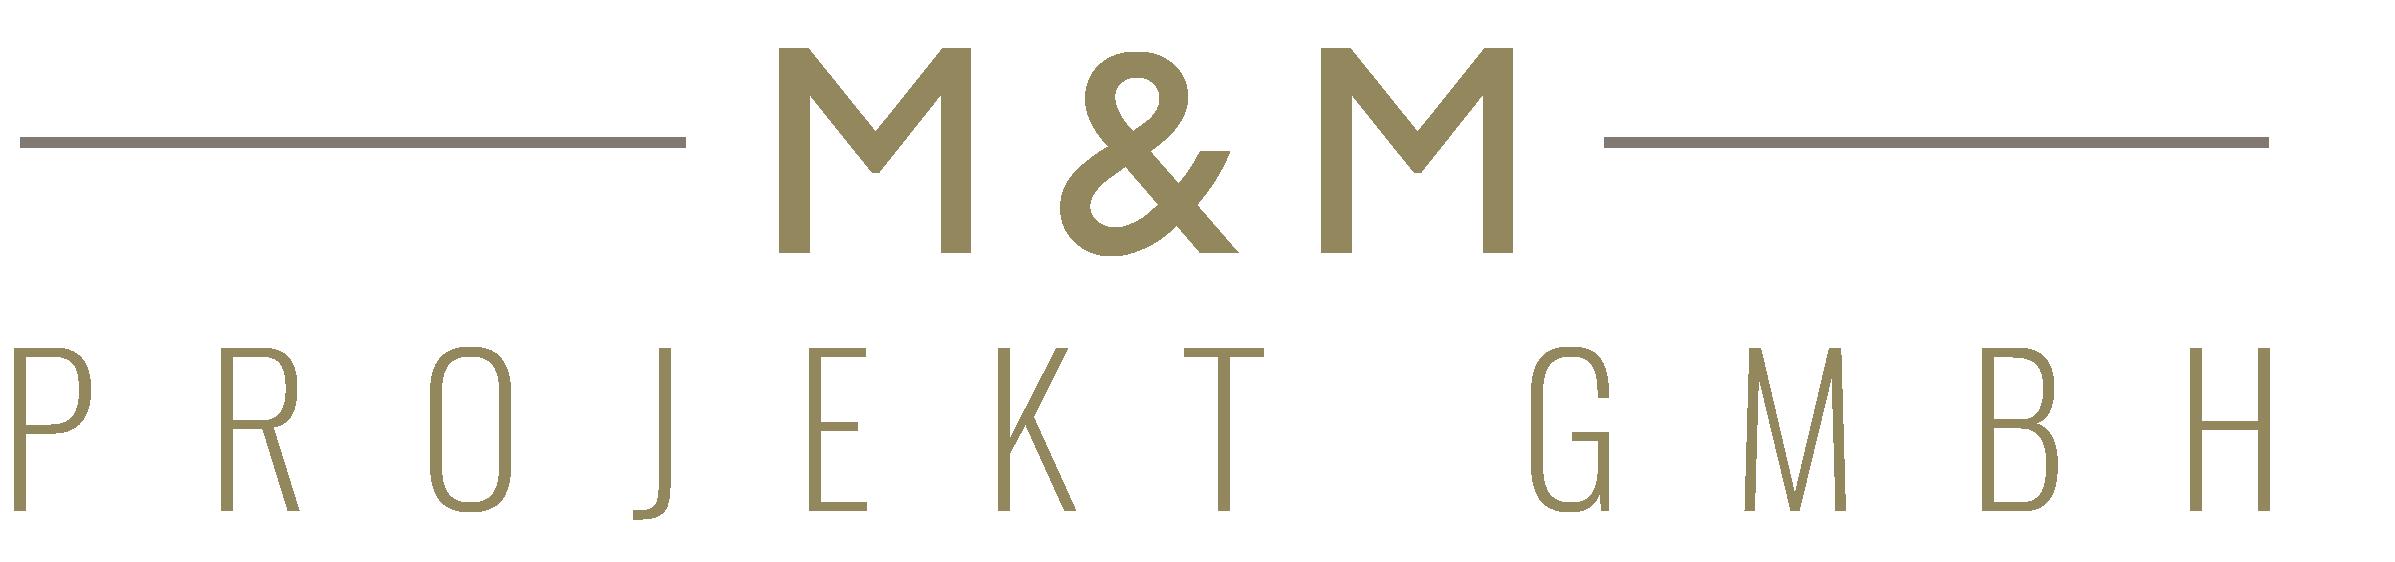 M&M Projekt GmbH Logo